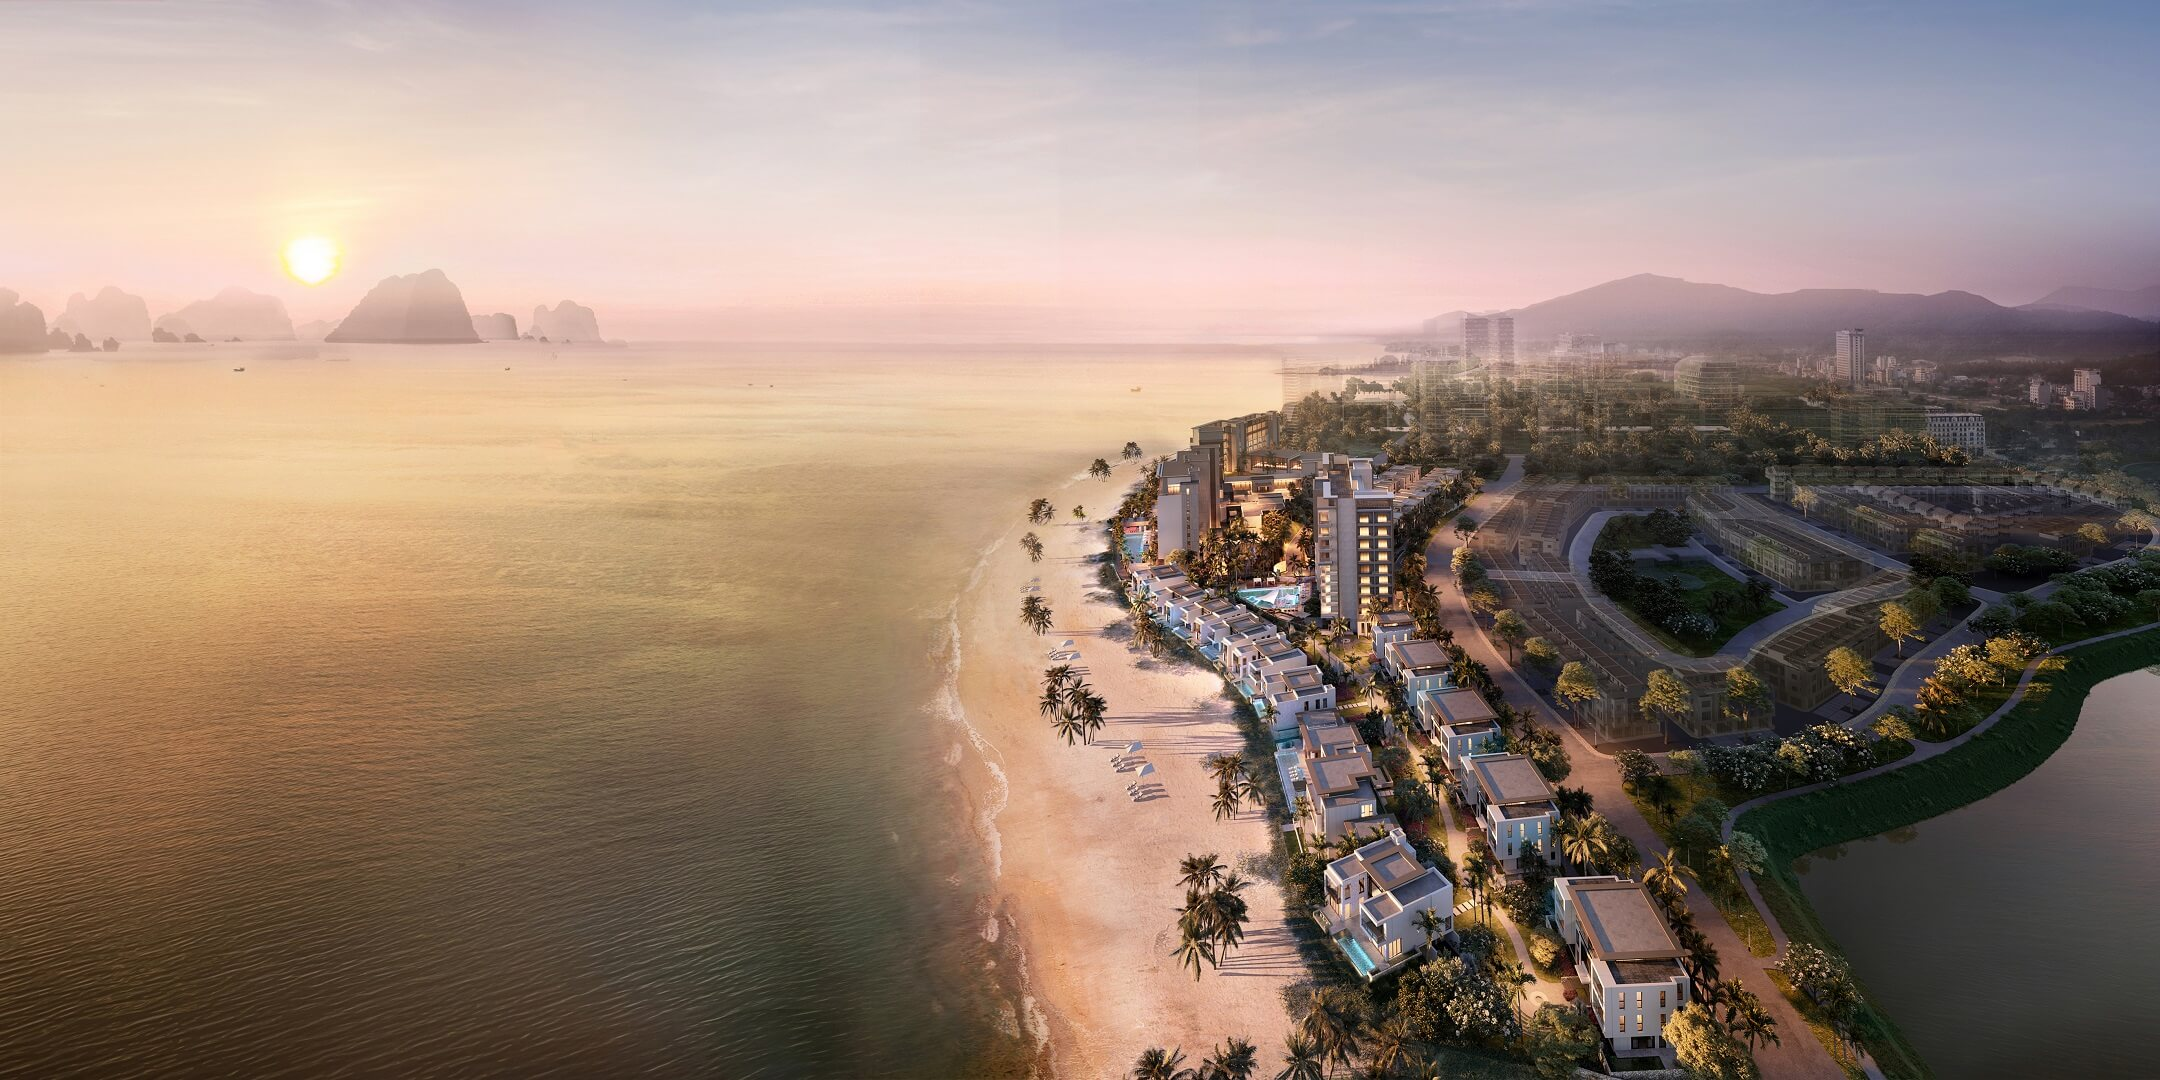 intercontinental hạ long bay resort & residences